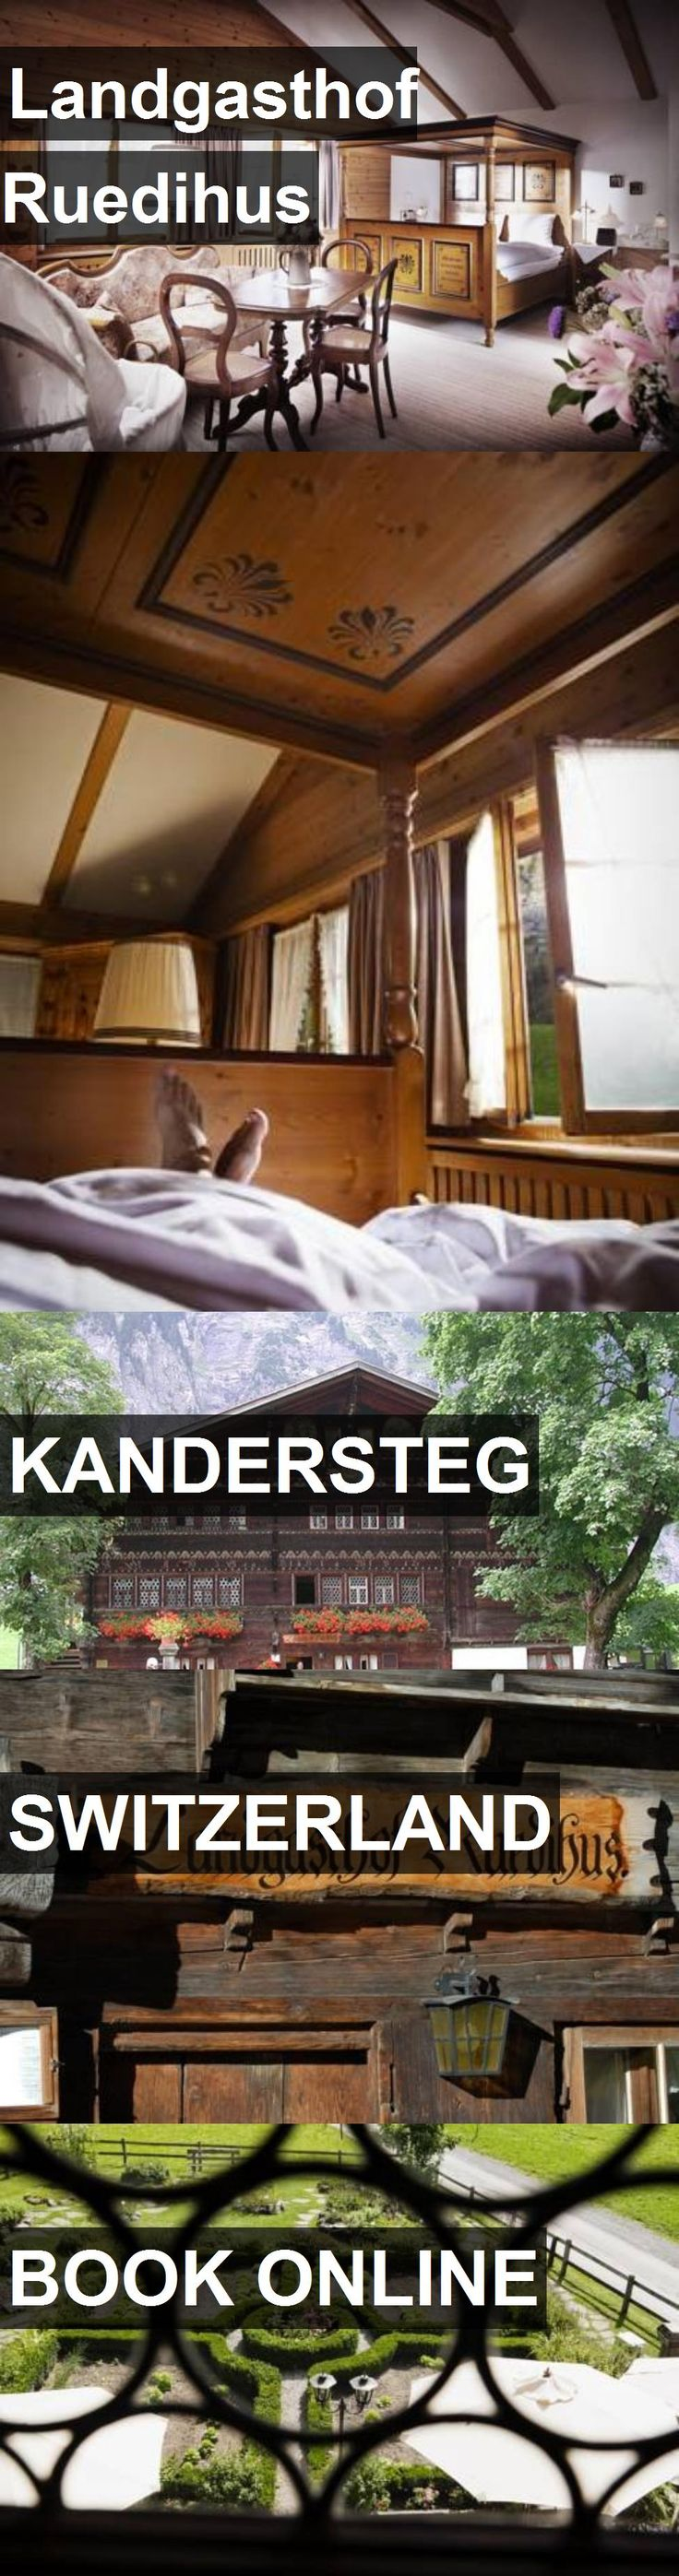 Hotel Landgasthof Ruedihus in Kandersteg, Switzerland. For more information, photos, reviews and best prices please follow the link. #Switzerland #Kandersteg #travel #vacation #hotel